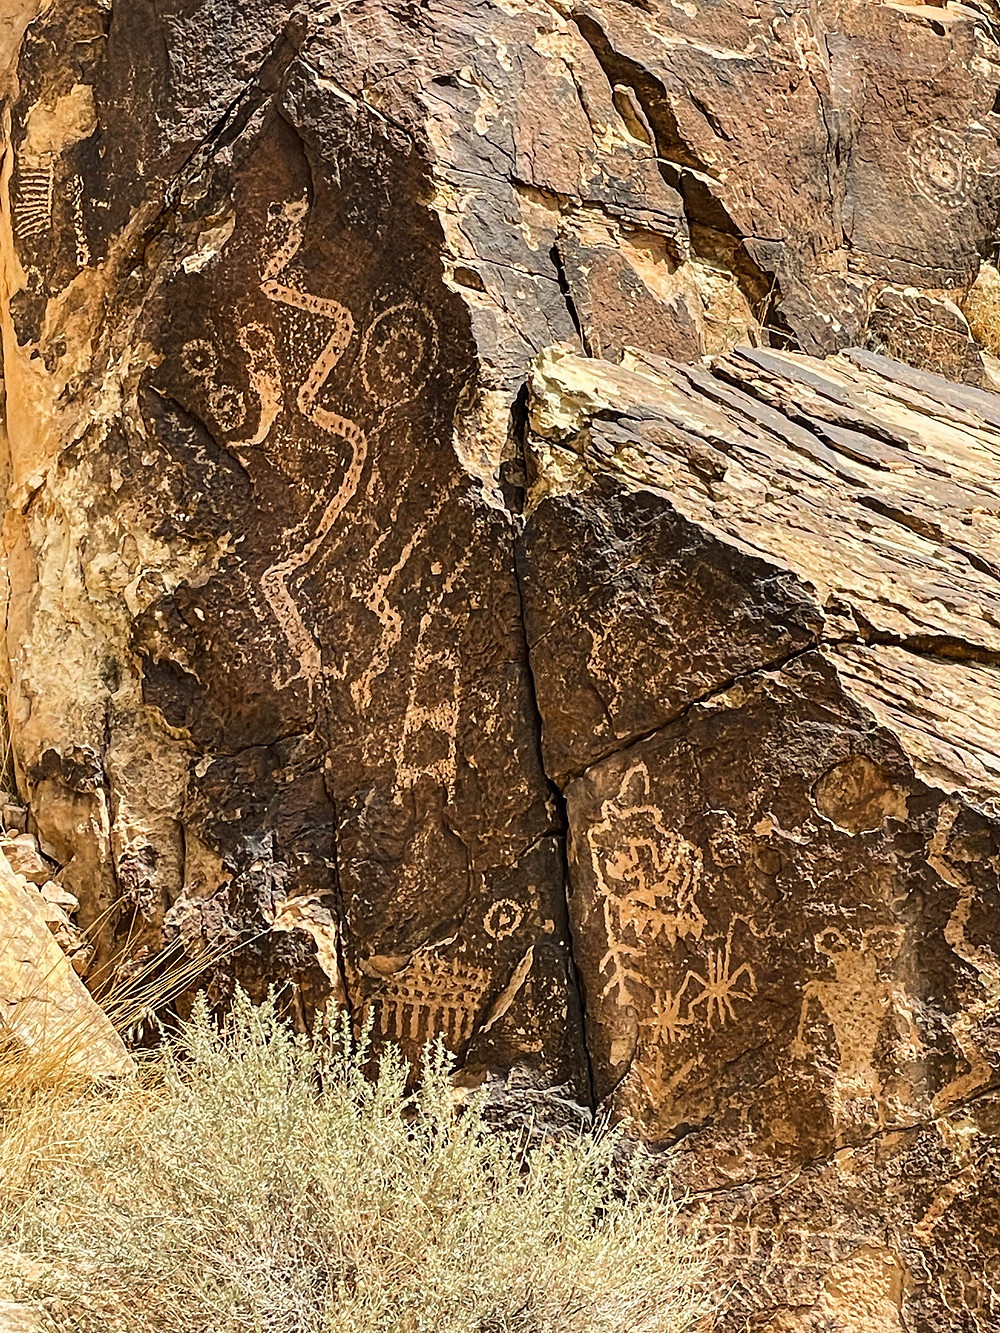 Many different symbols are found amongst the petroglyphs of the Parowan Gap located near Parowan Utah